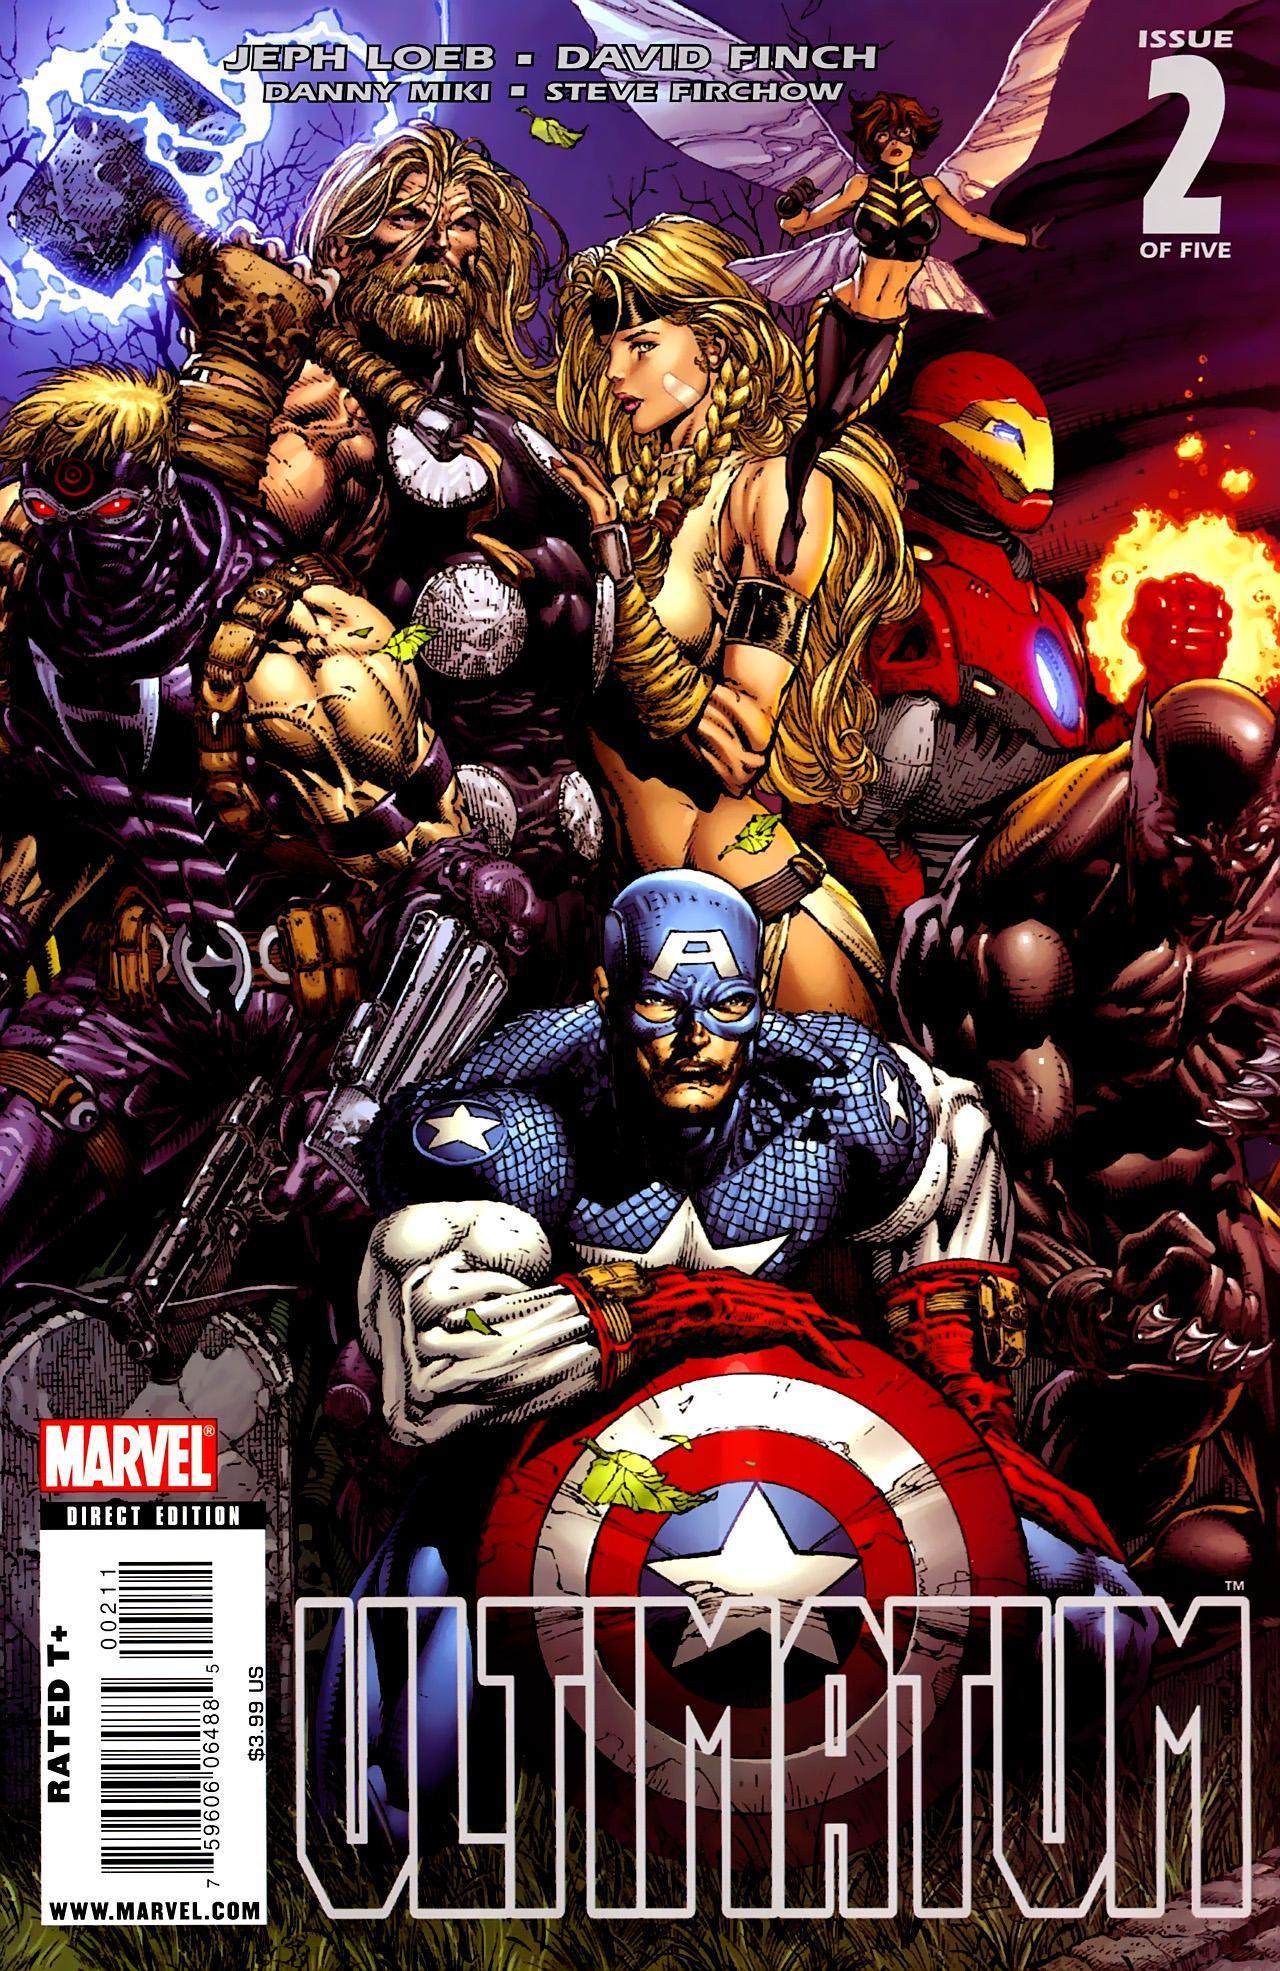 Fresh Content Day 44: Marvel's Ultimatum